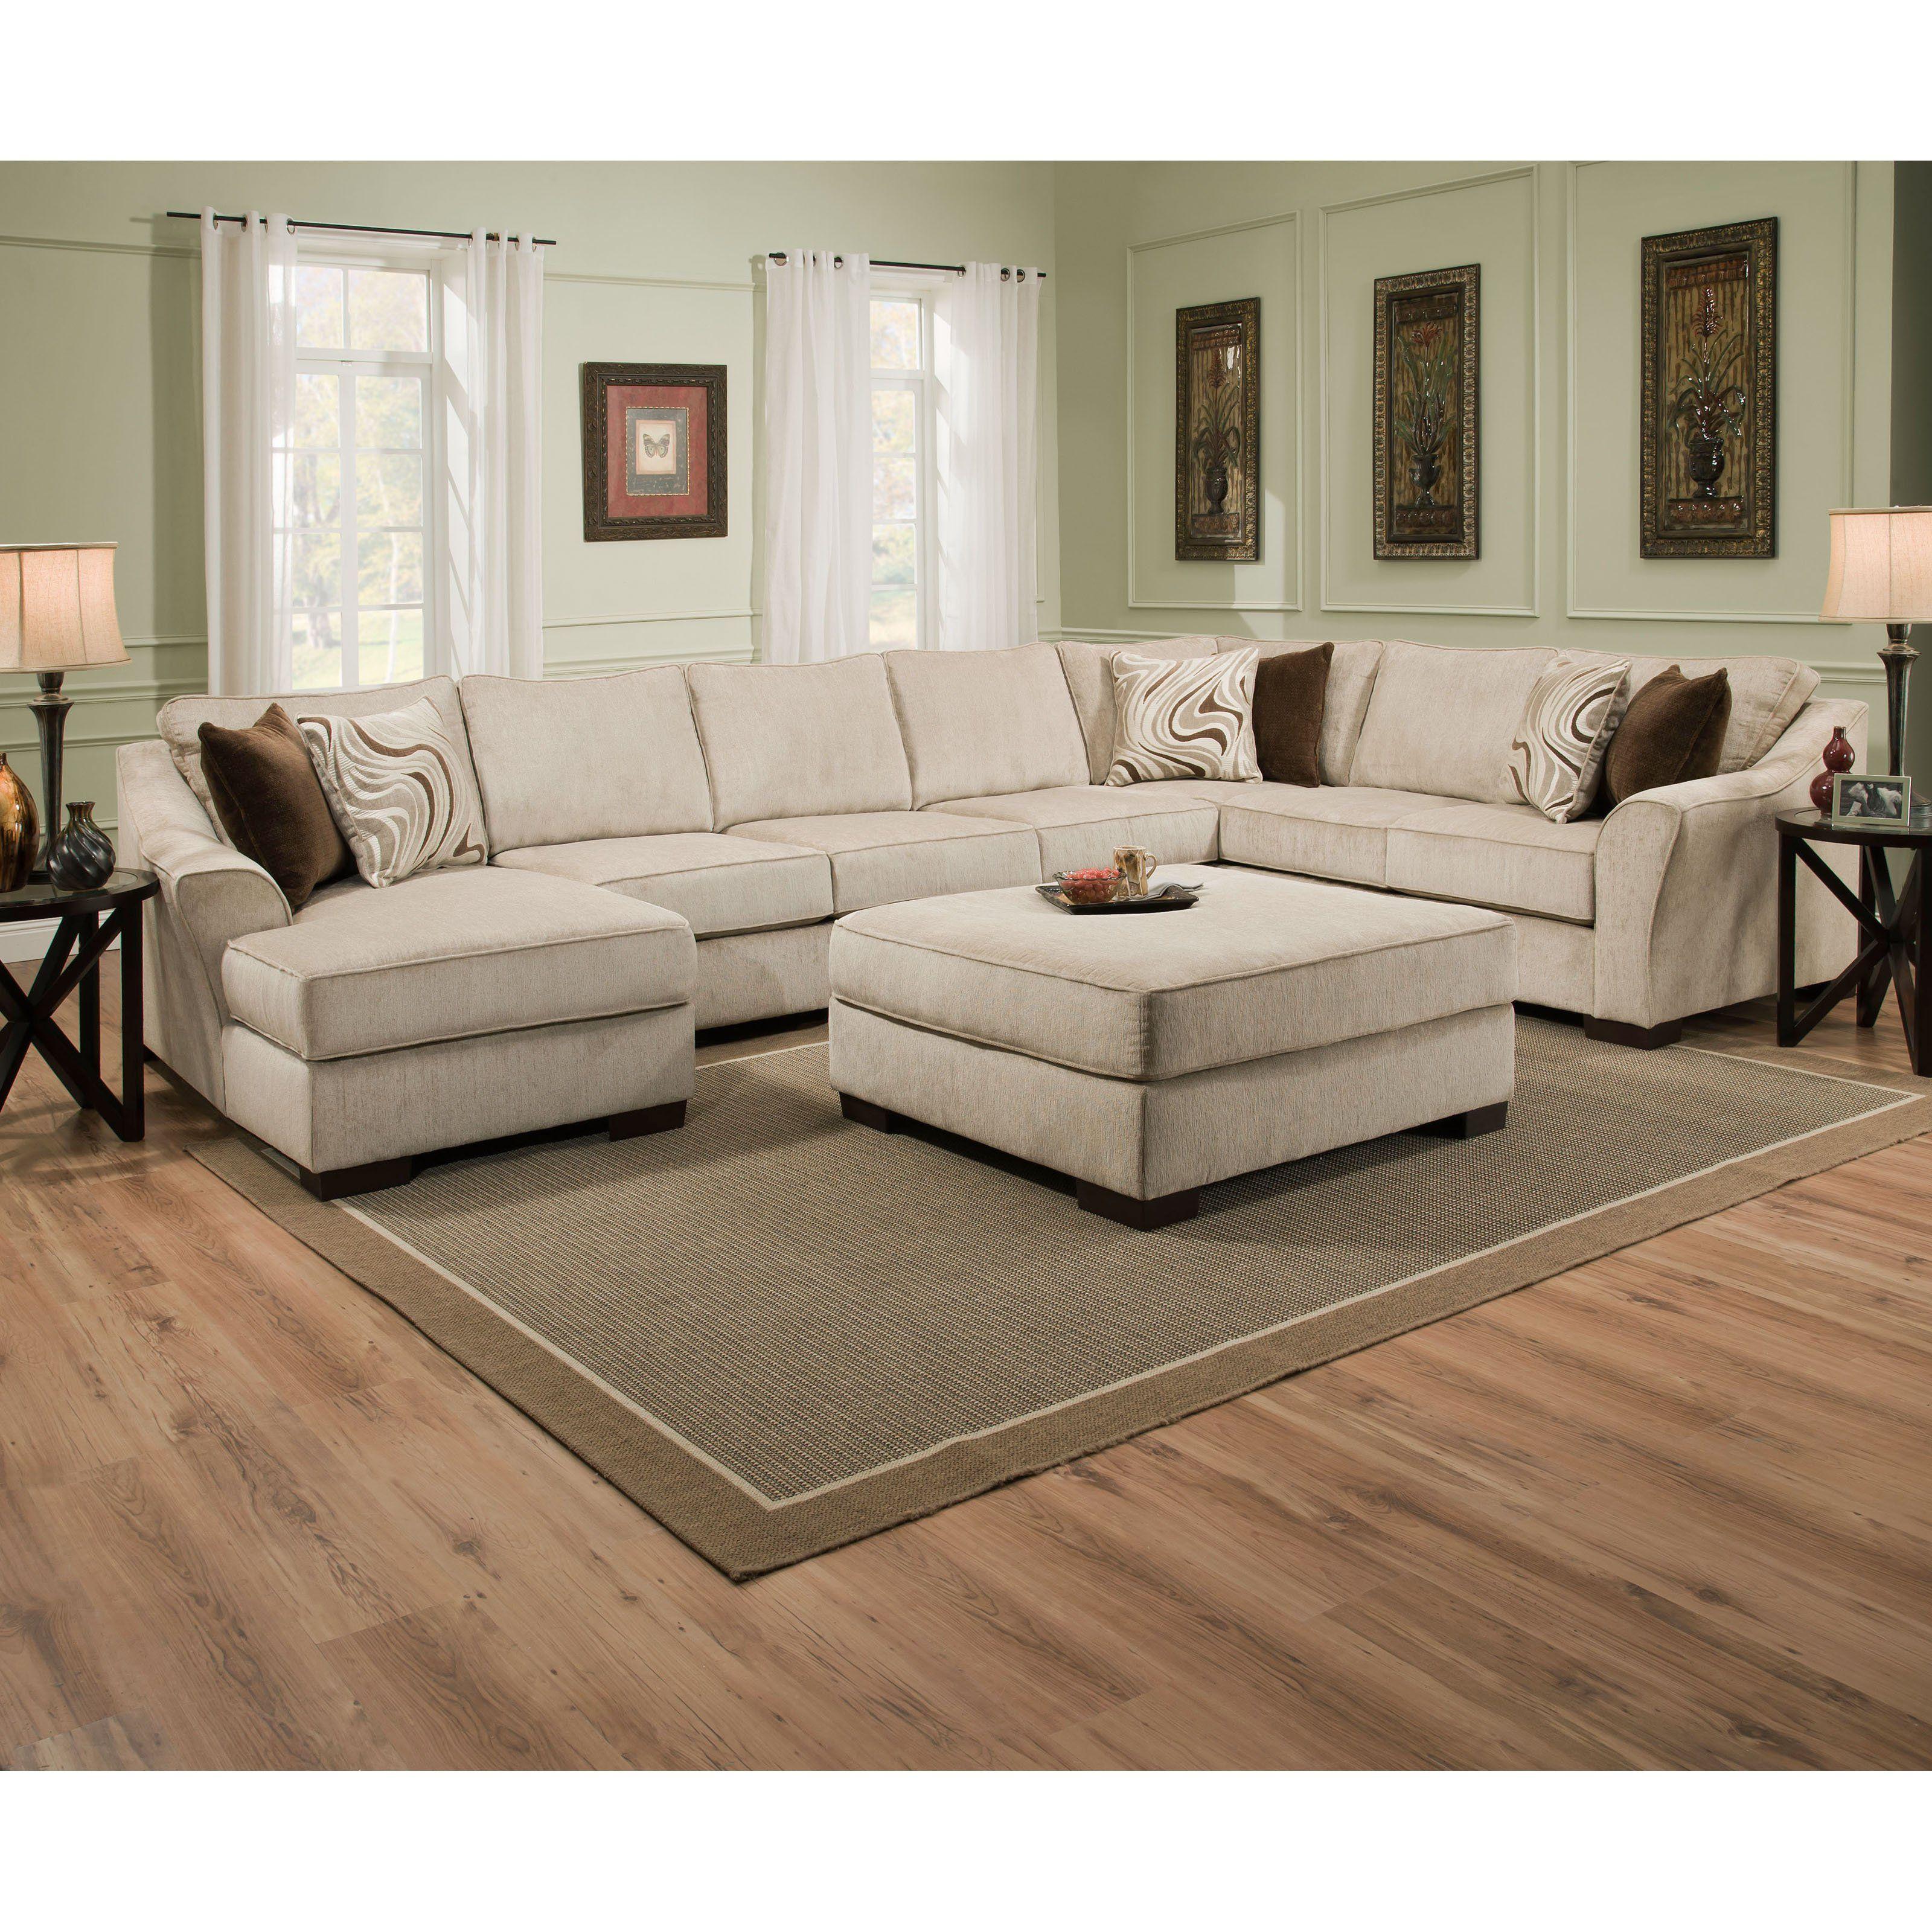 Simmons Kingley Right Facing Sofa Sectional With Chaise Udf382 Large Sectional Sofa Sectional Sofa Sectional